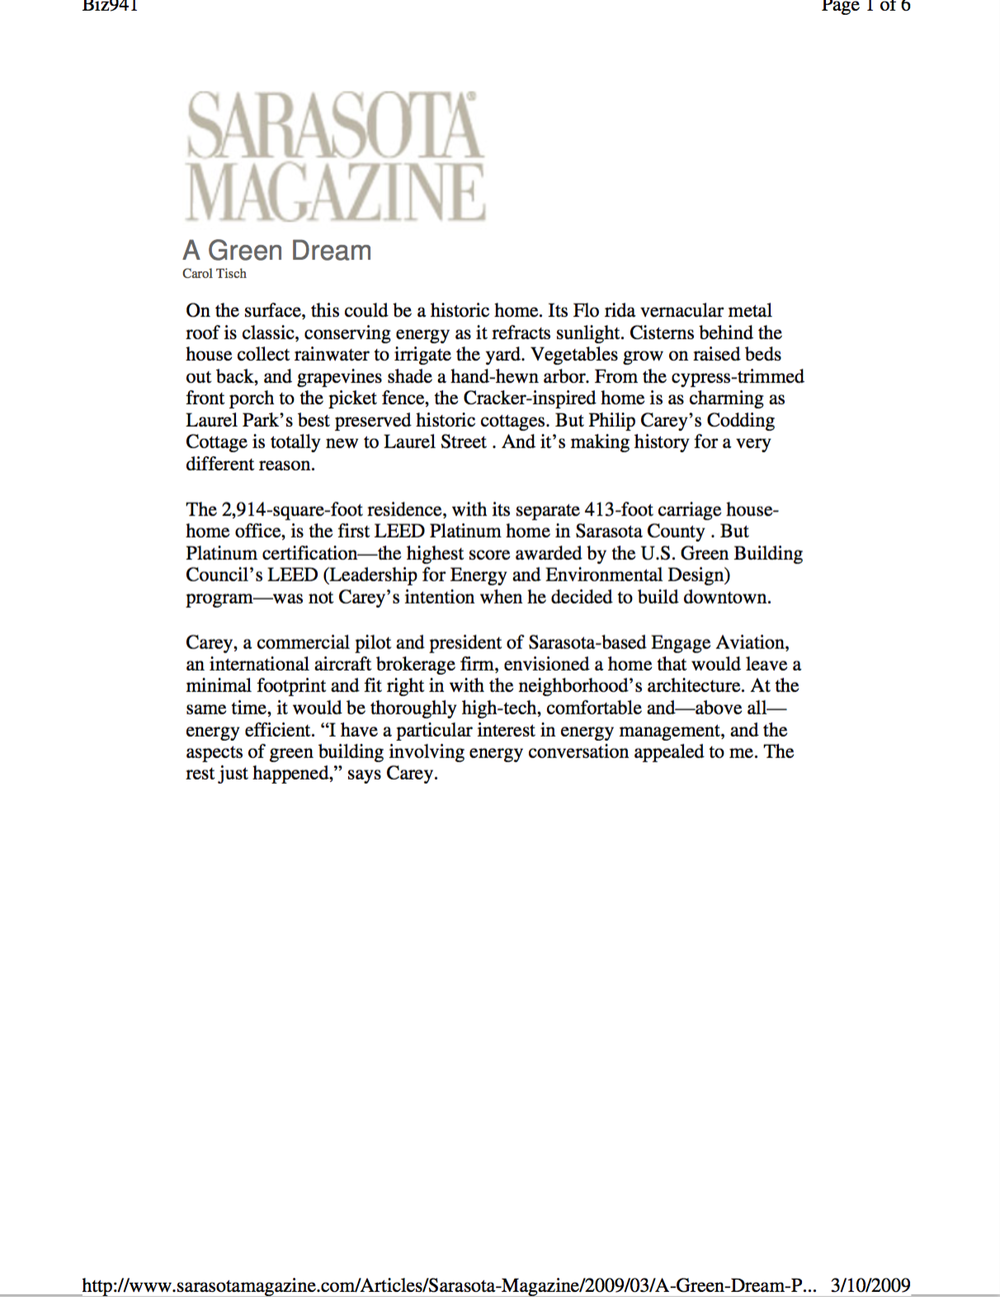 sarasota-magazine-green-dream_pdf.png